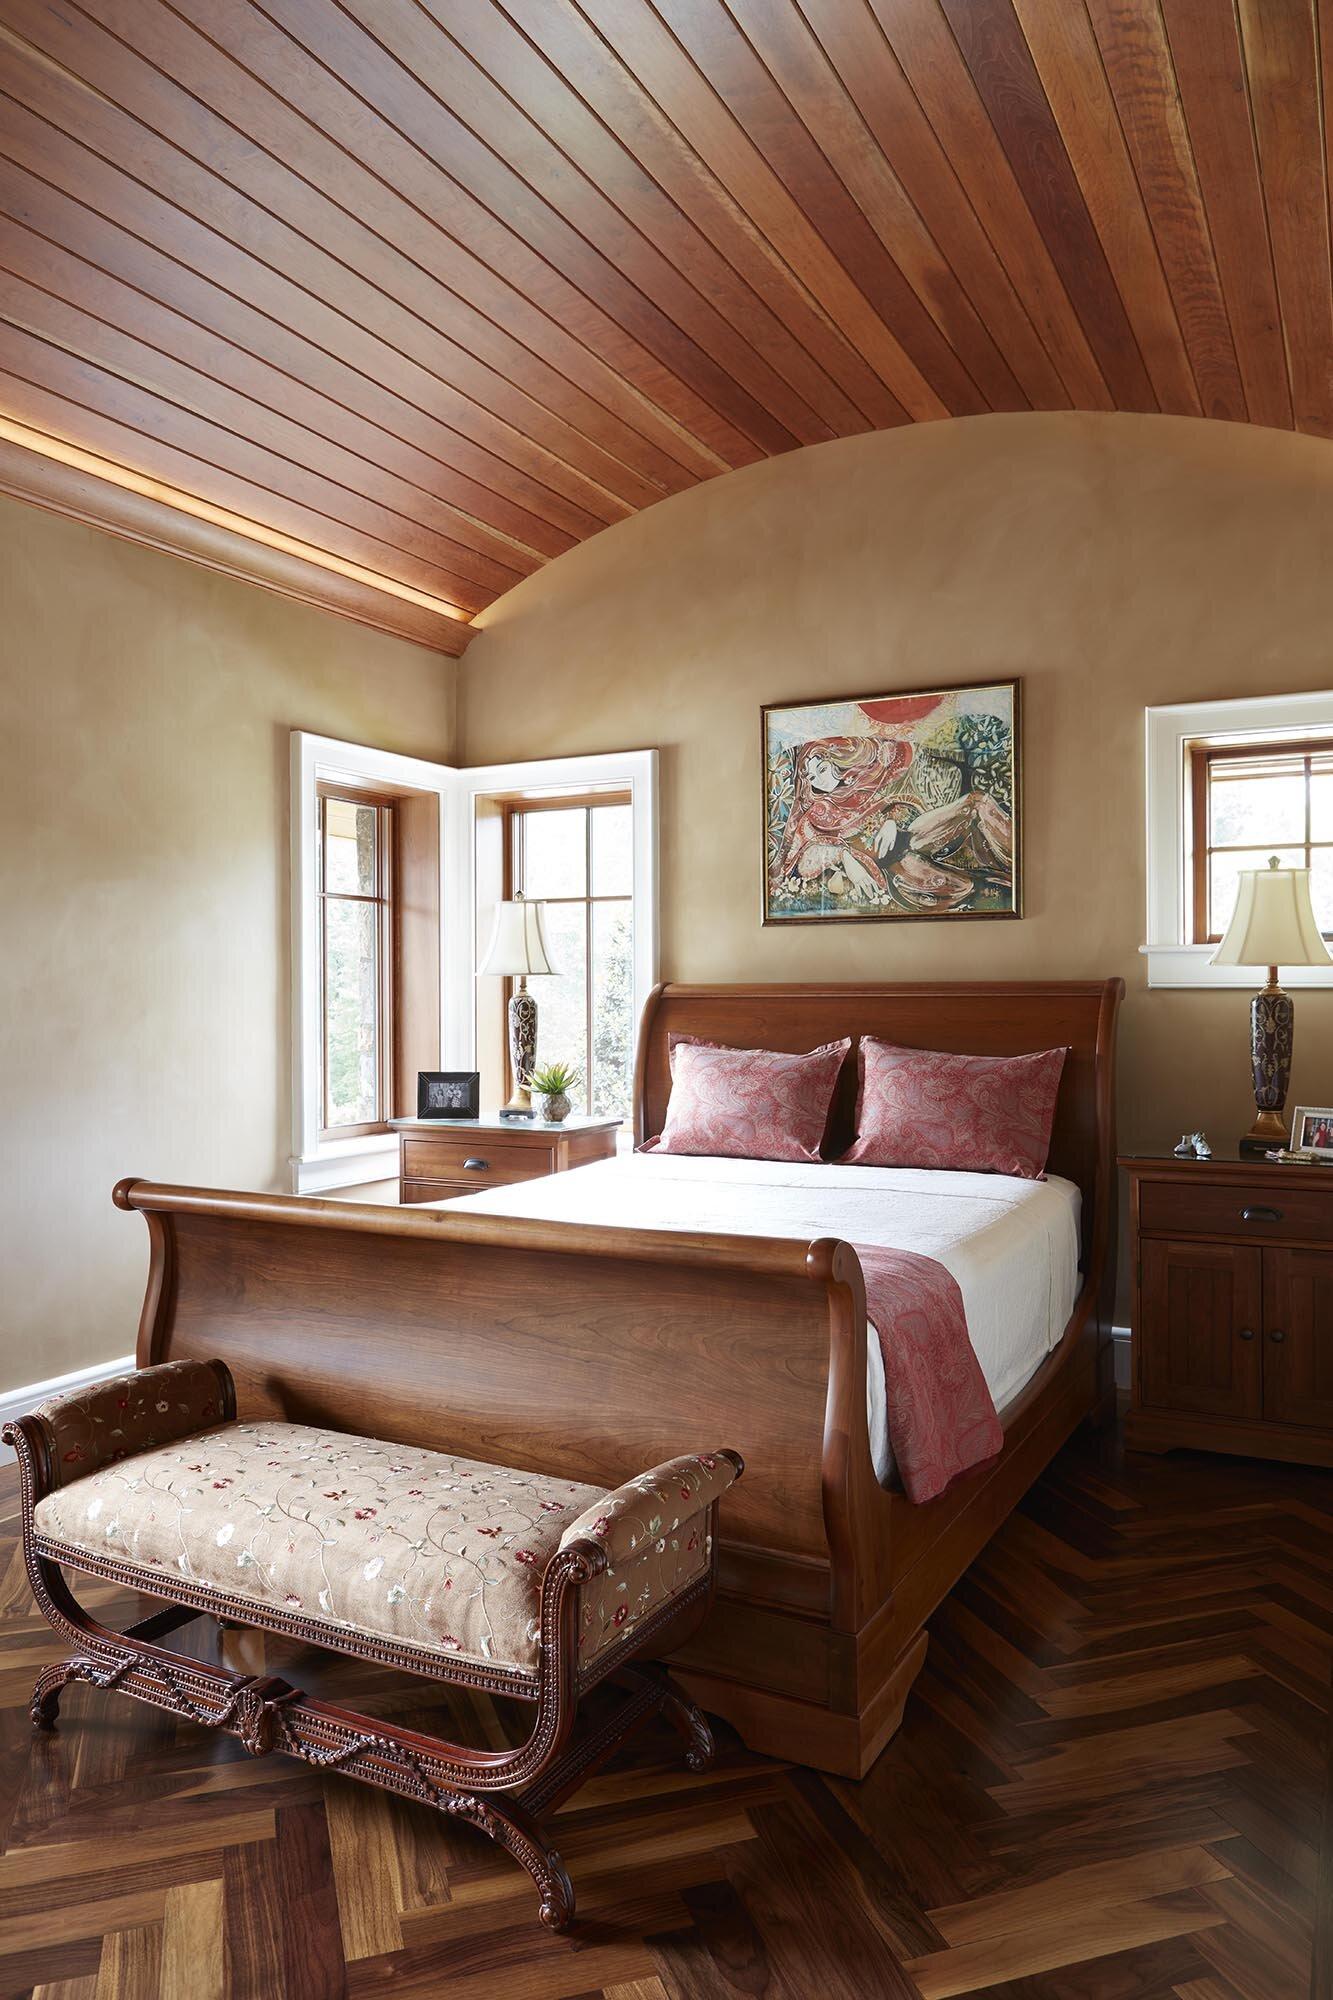 BedroomAlt1_Overall.jpg